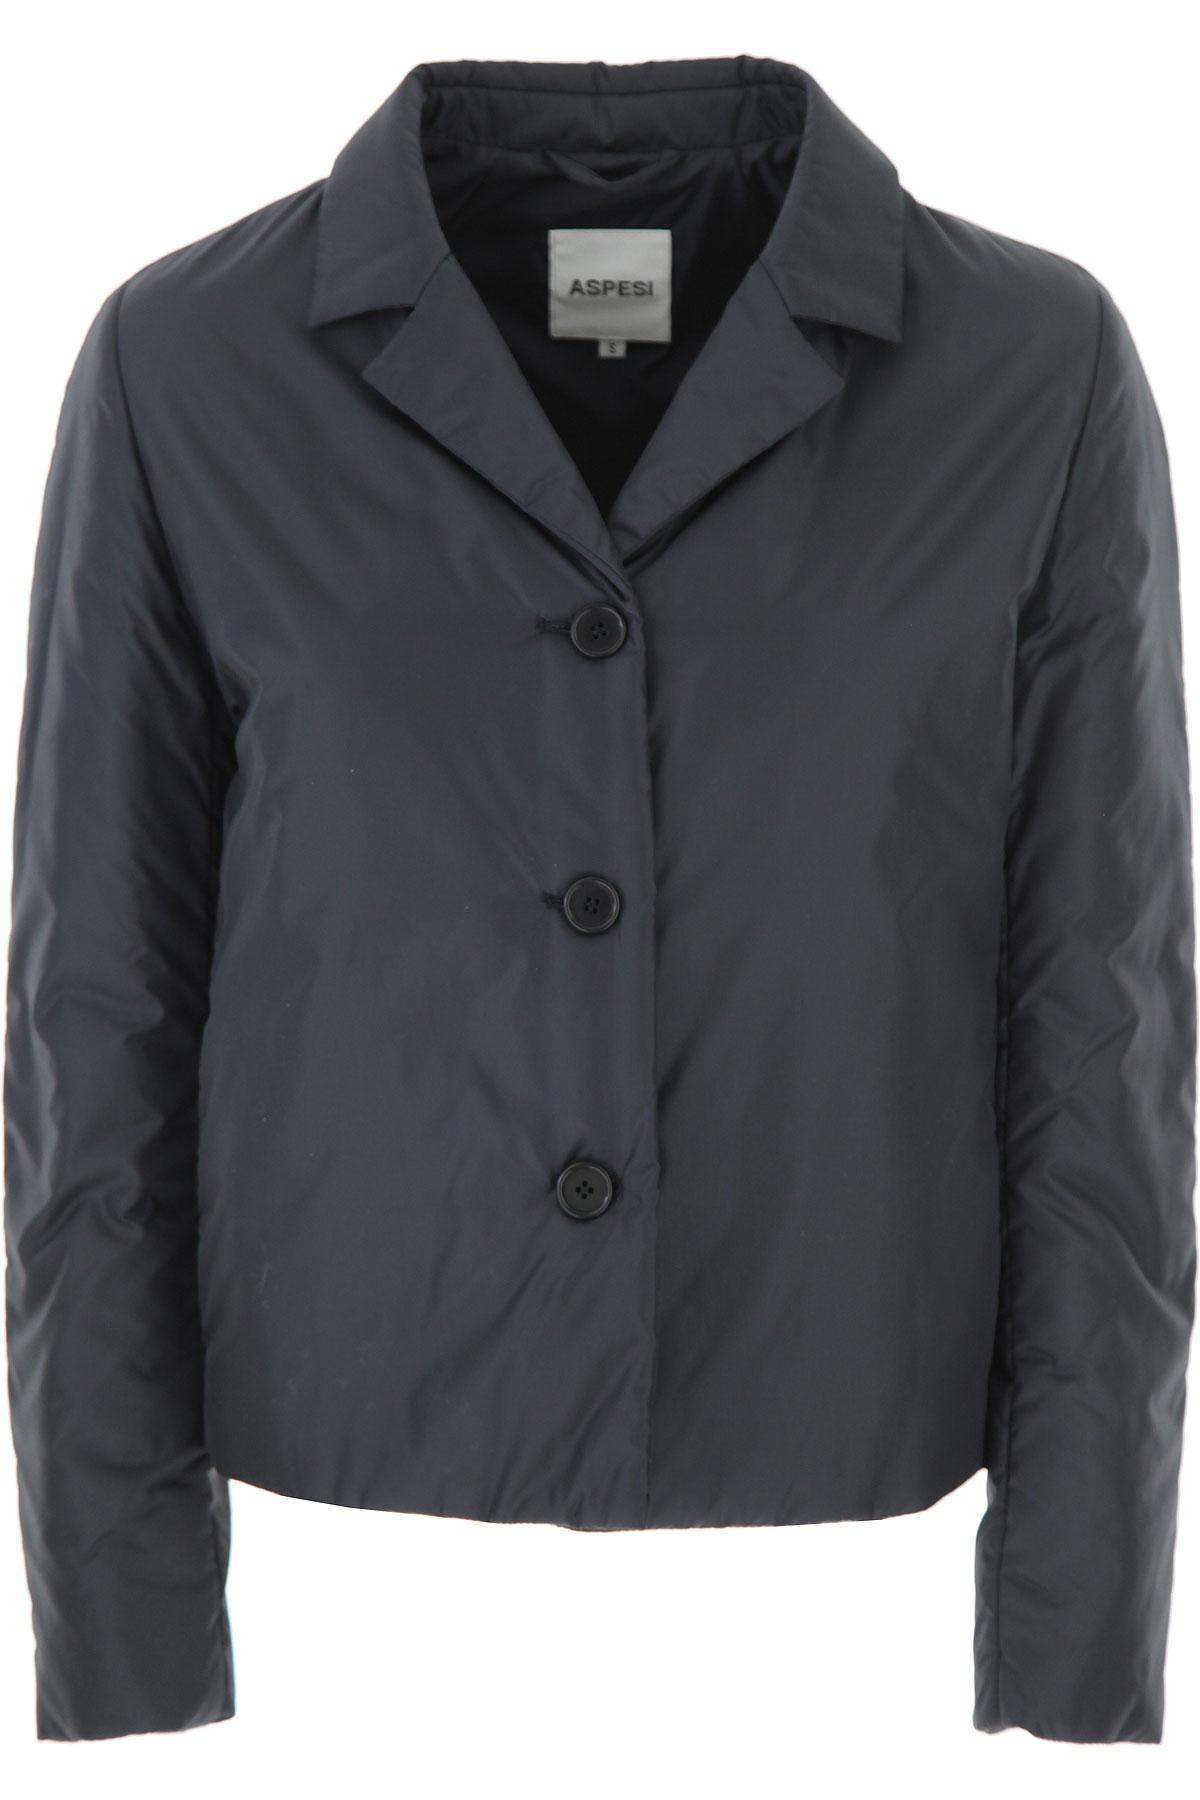 Aspesi Jacket for Women On Sale, Blue Ink, polyamide, 2019, 4 6 8